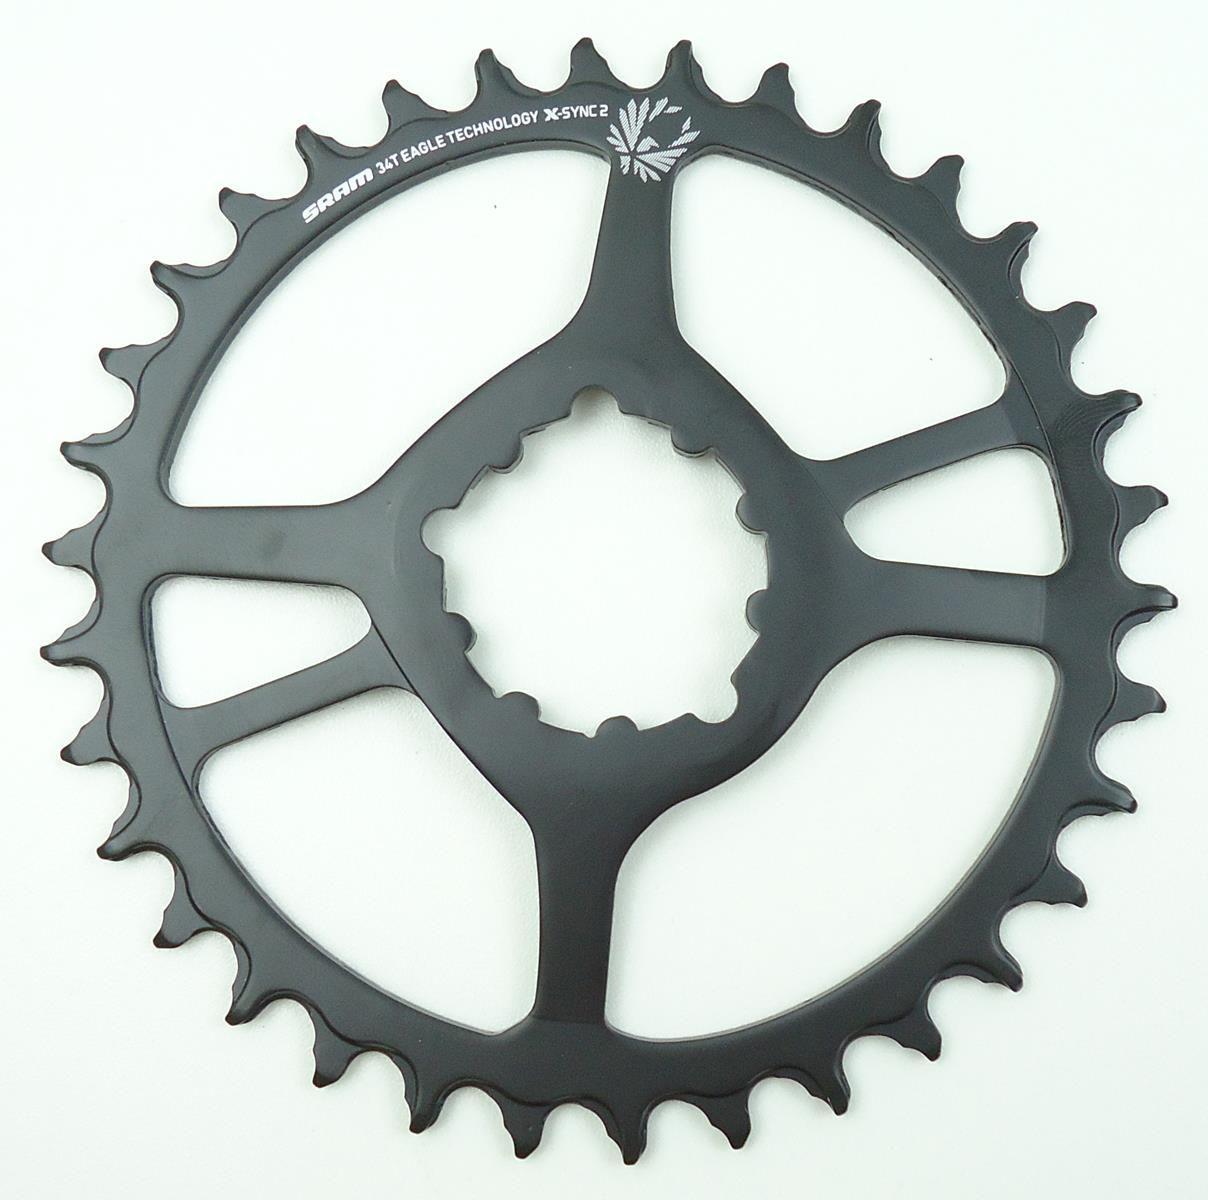 Coroa Bicicleta Sram NX Eagle 34t Boost Preta em Aço Para Uso 1x12 Off set 3mm GX XX1